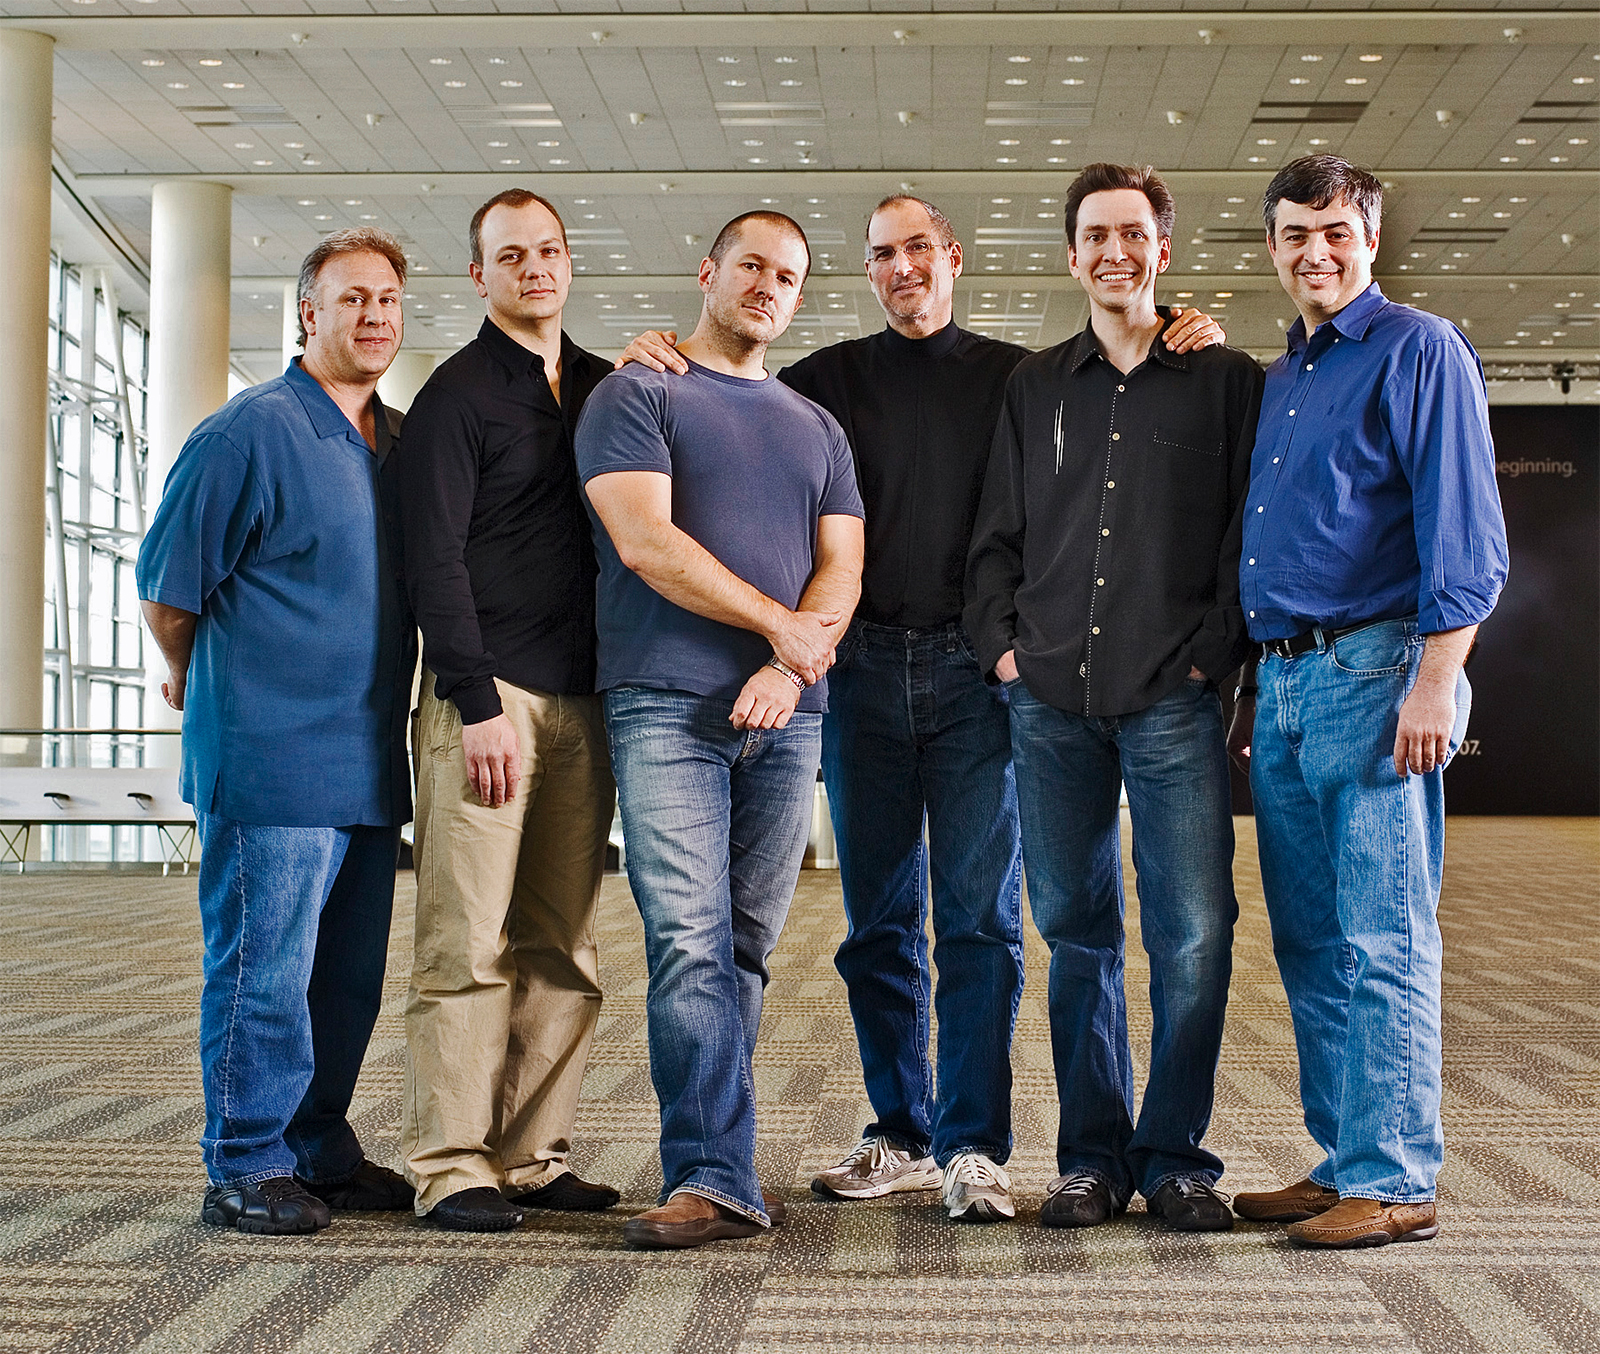 Tony Fadell, Steve Jobs, Jonathan Ive, Scott Forstall, Edy Cue y Phil Schiller